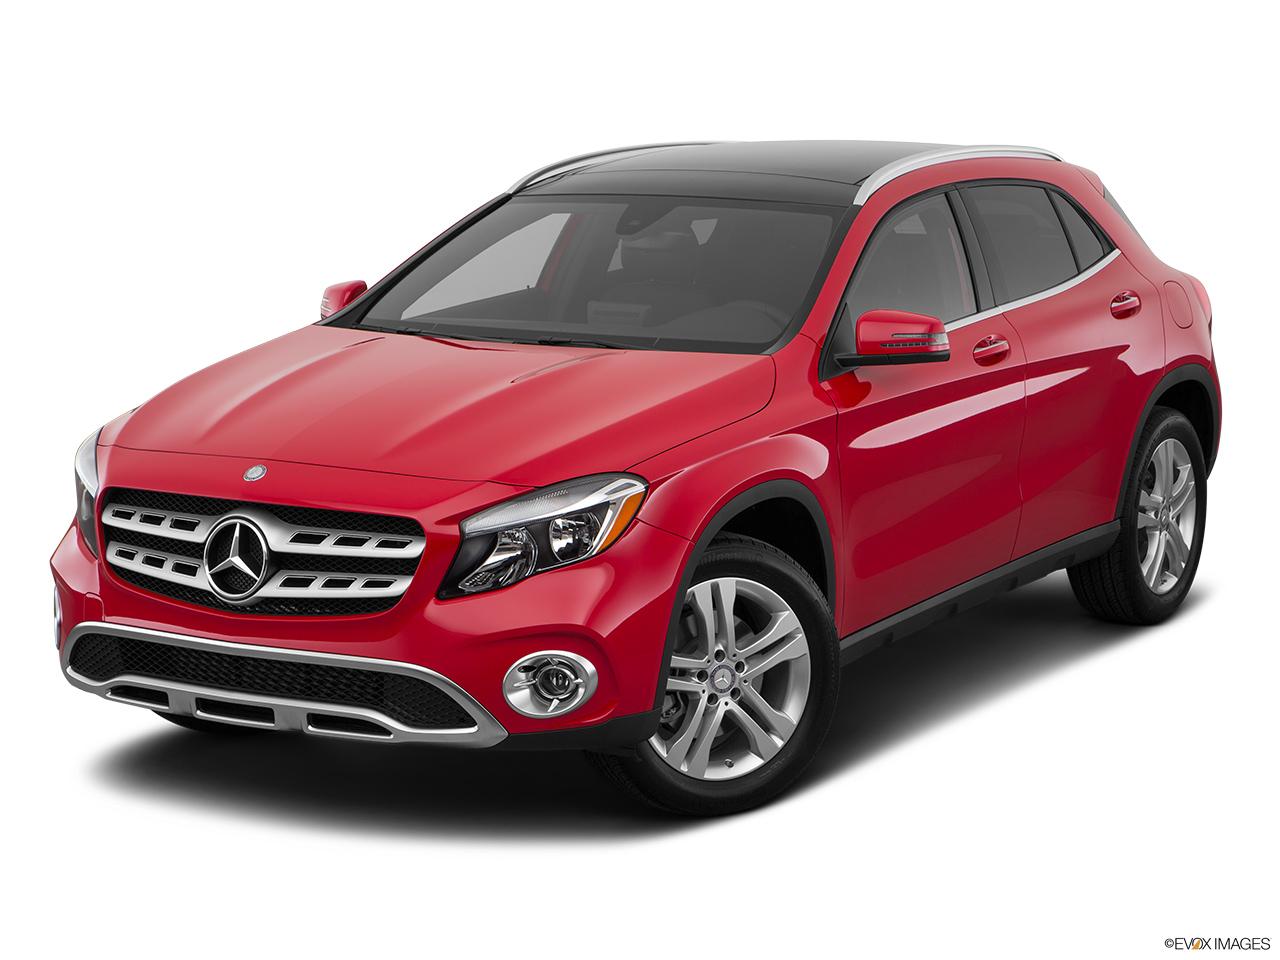 Mercedes benz gla price in egypt new mercedes benz gla for Mercedes benz gla prices